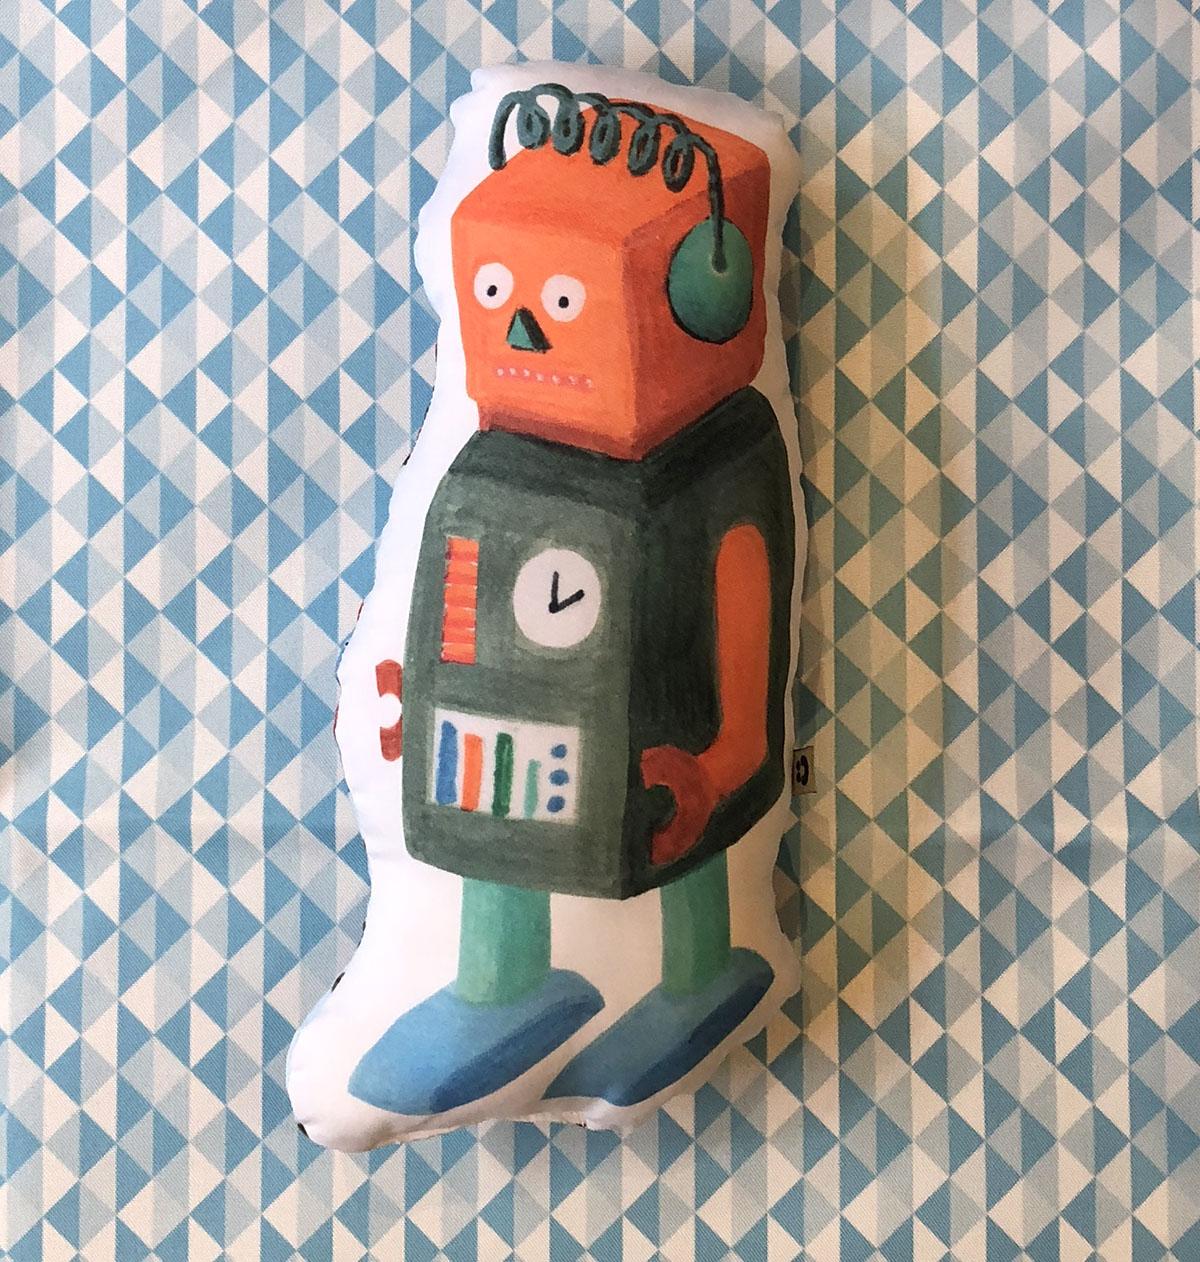 Almofada Toy Robô 2